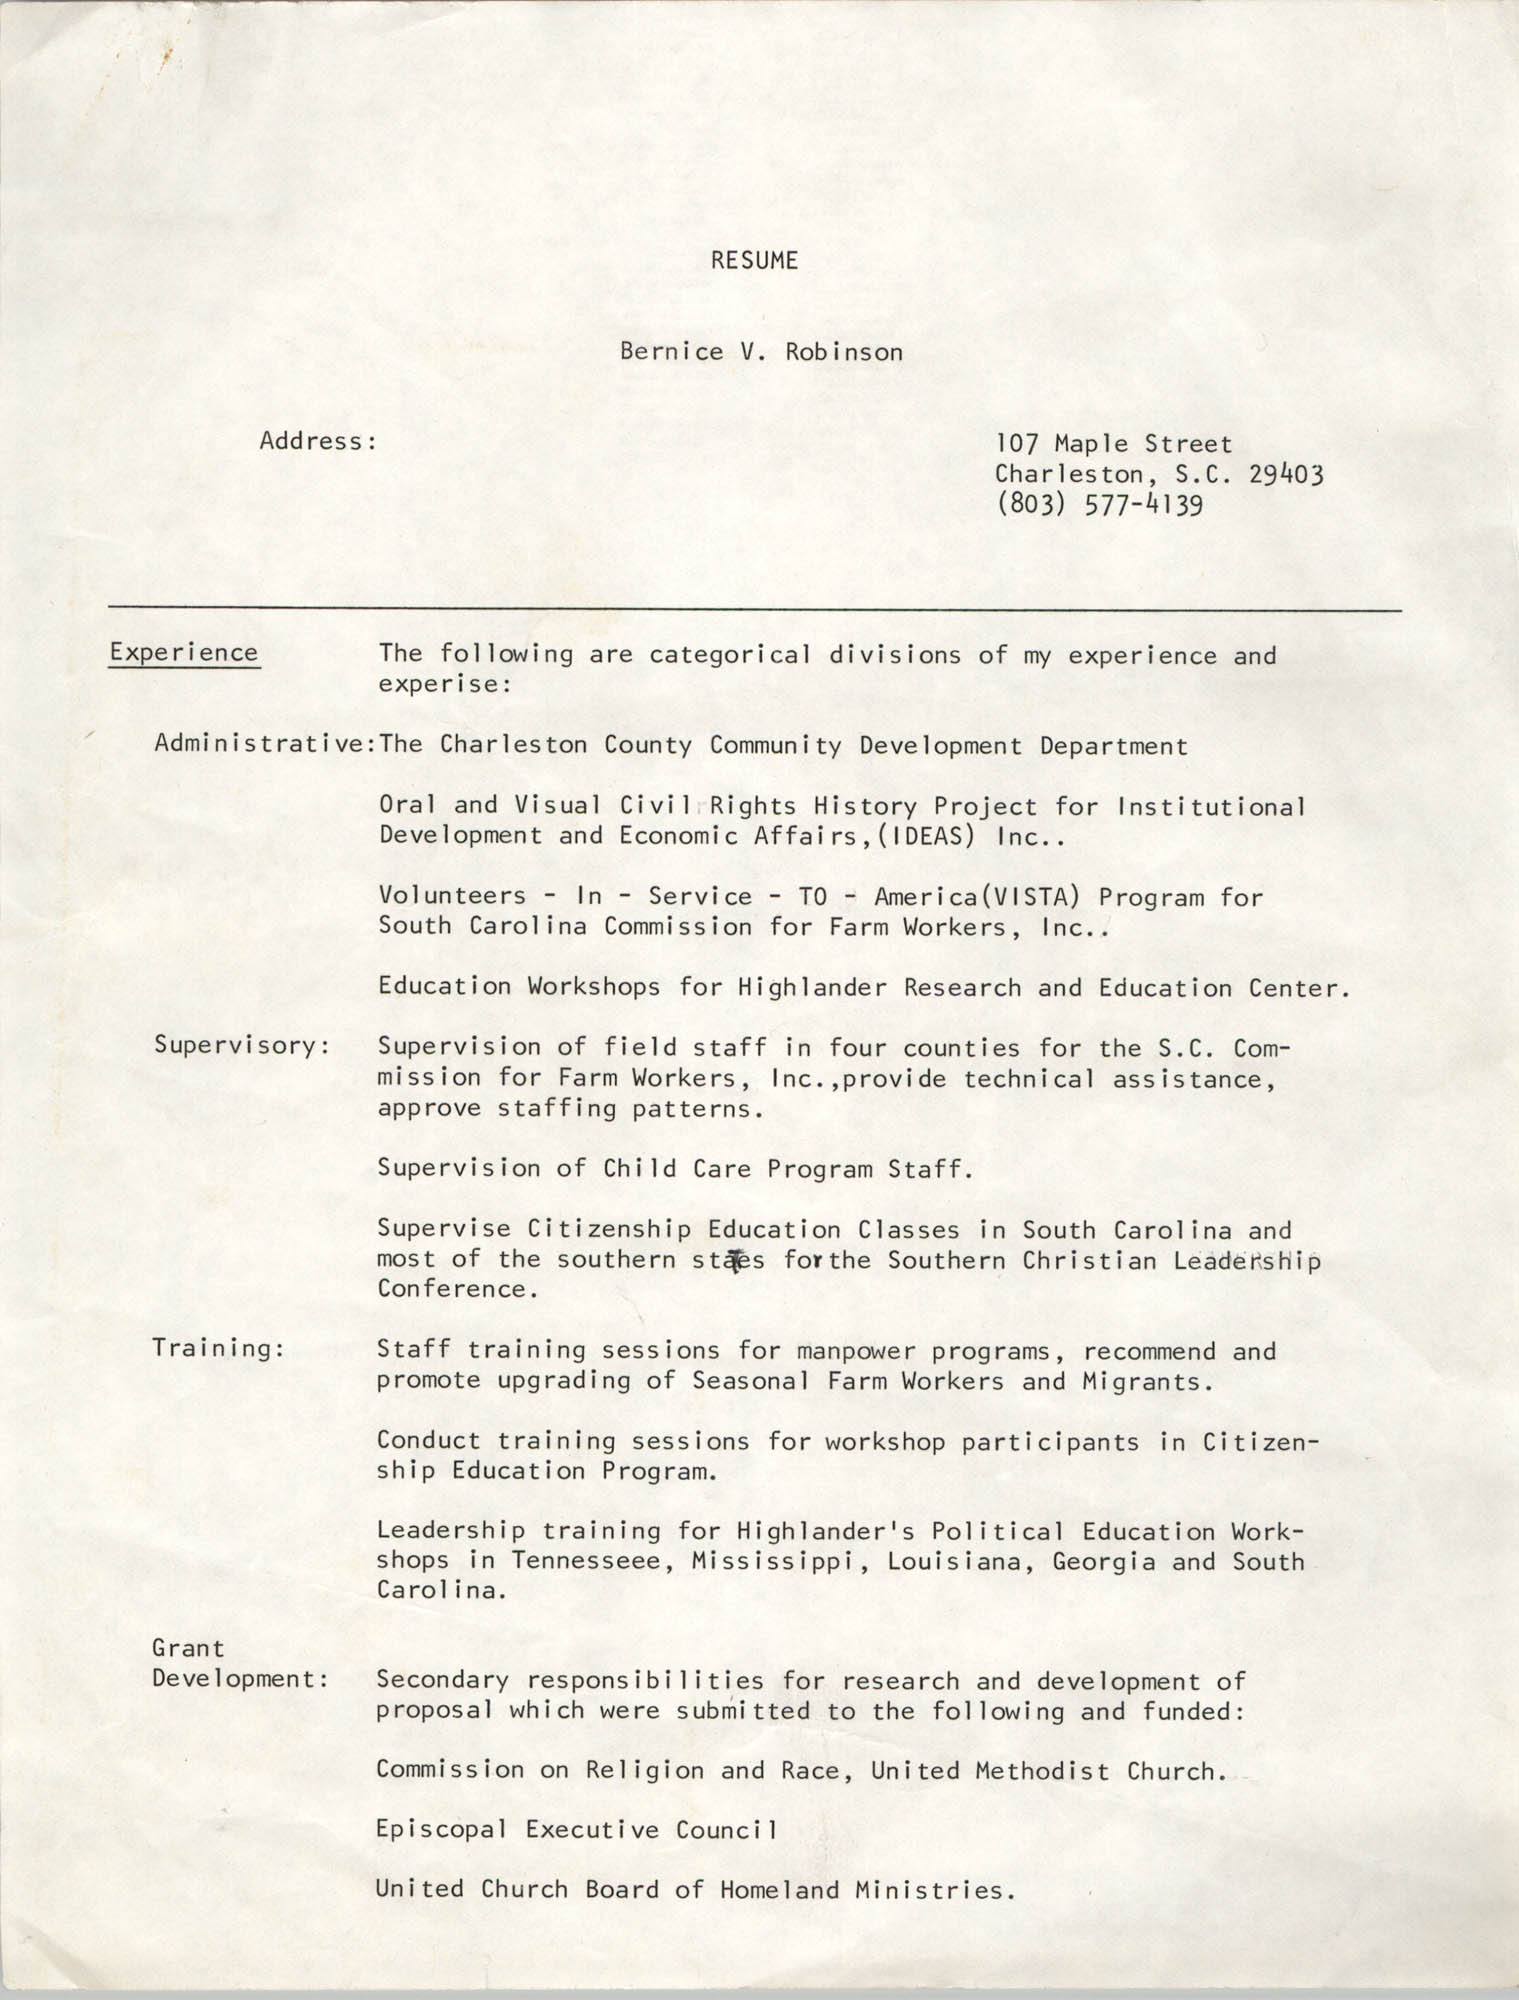 Bernice V. Robinson Four-Page Resume